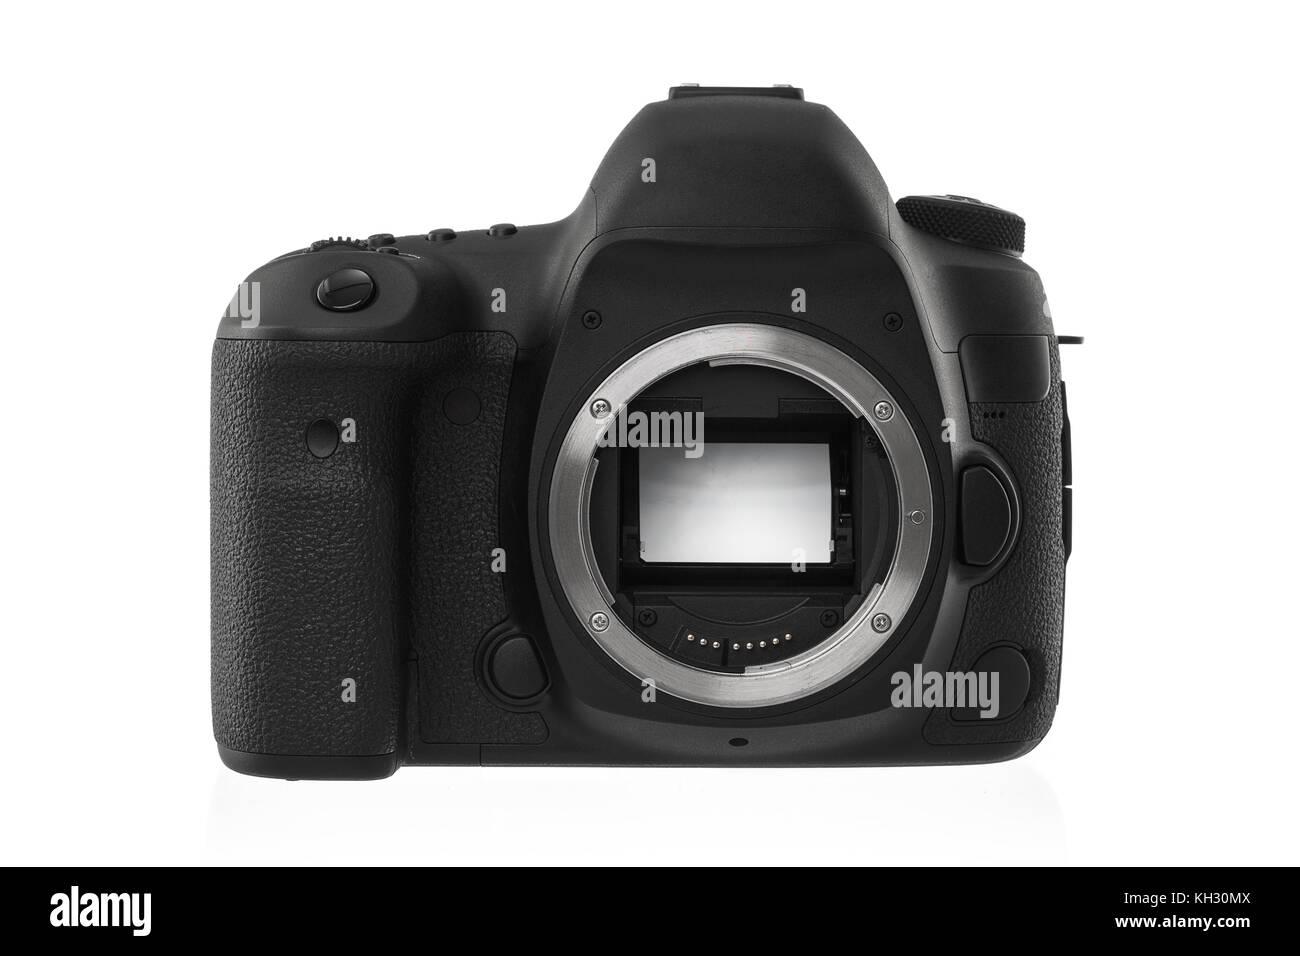 Isolated SLR camera on a white background - Stock Image